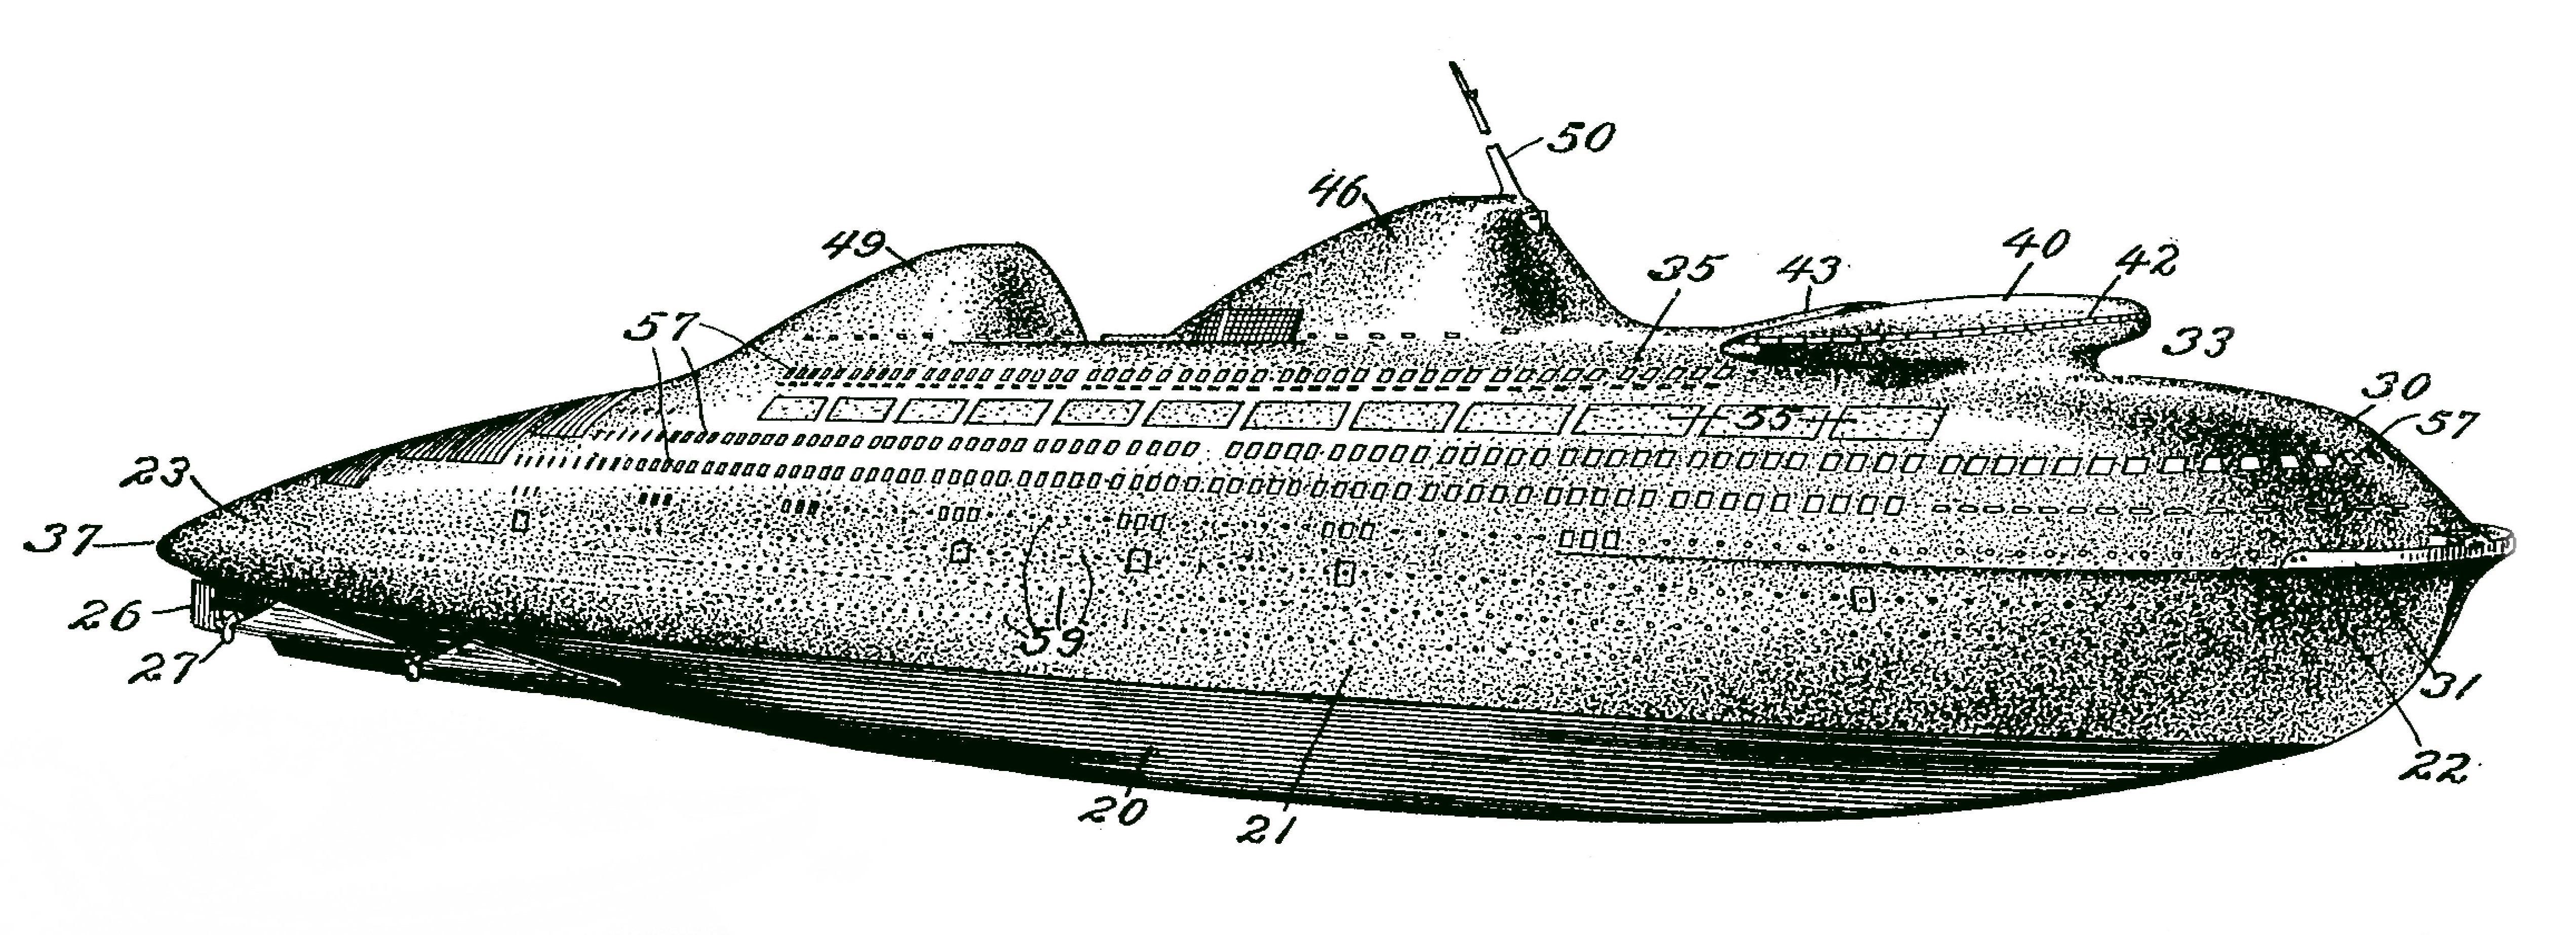 Norman Bel Geddes Ocean liner bateau plaisance